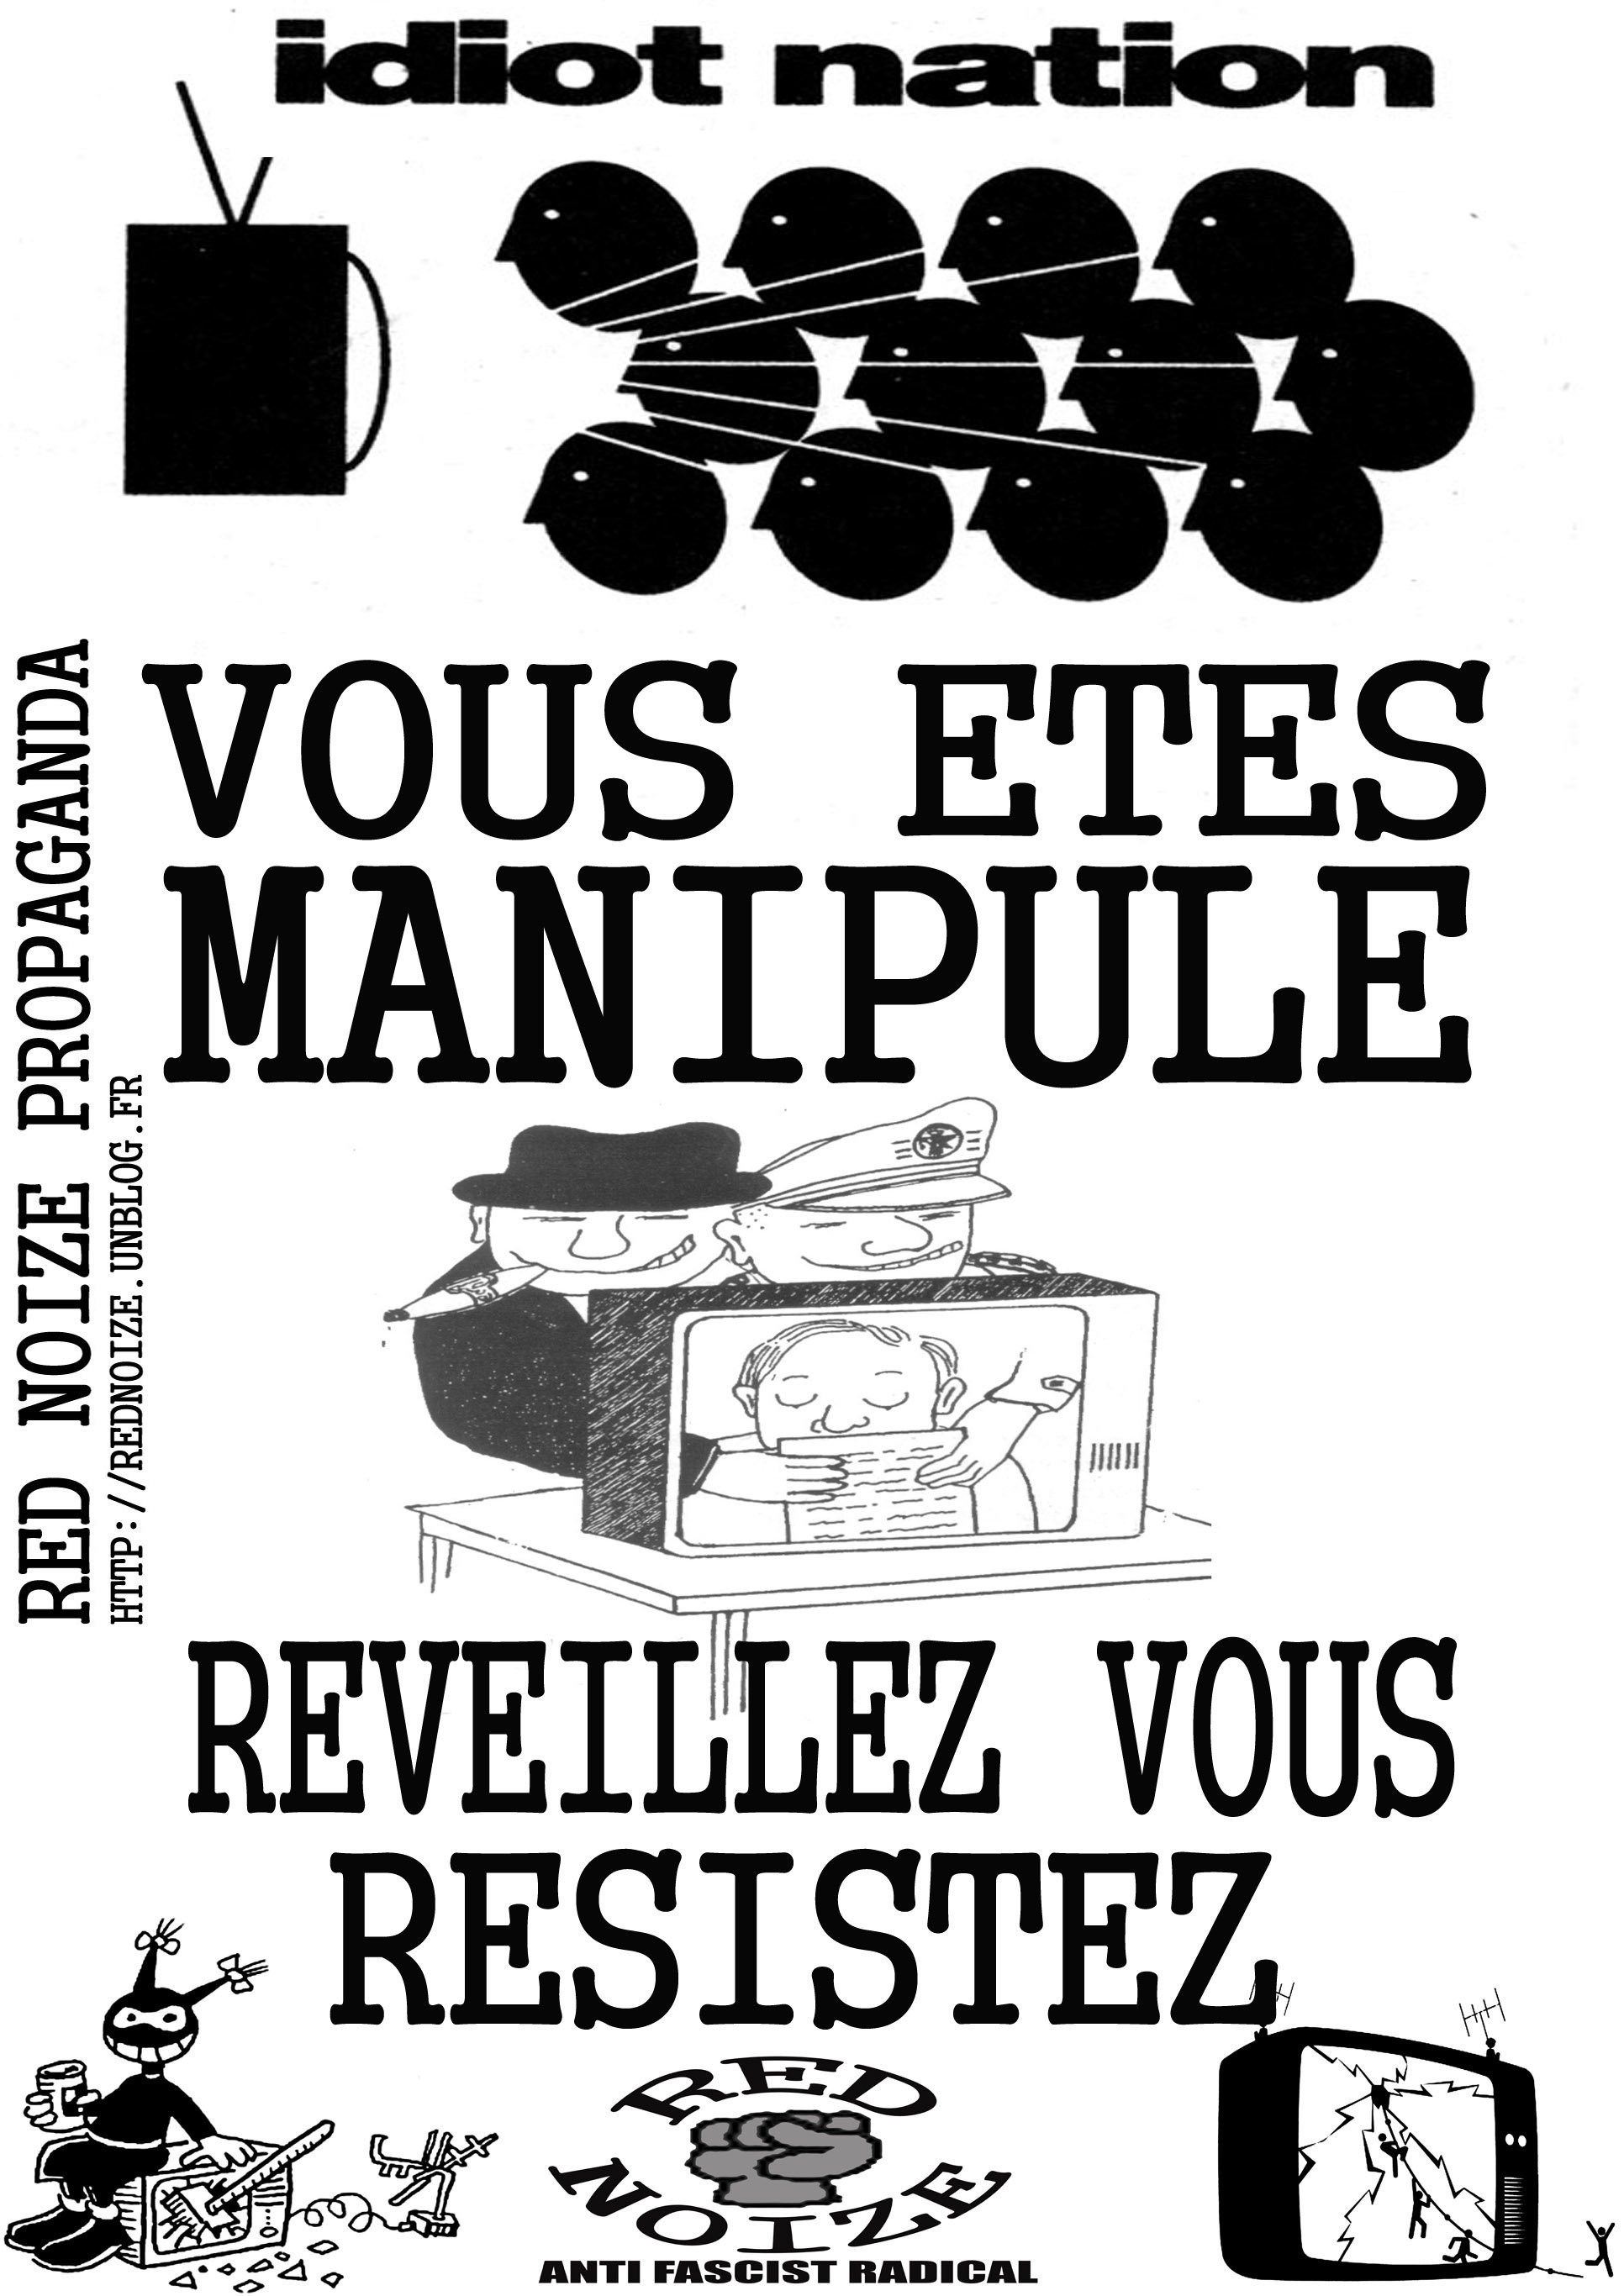 http://rednoize.e.r.f.unblog.fr/files/2007/05/tvmanipulecopier.jpg